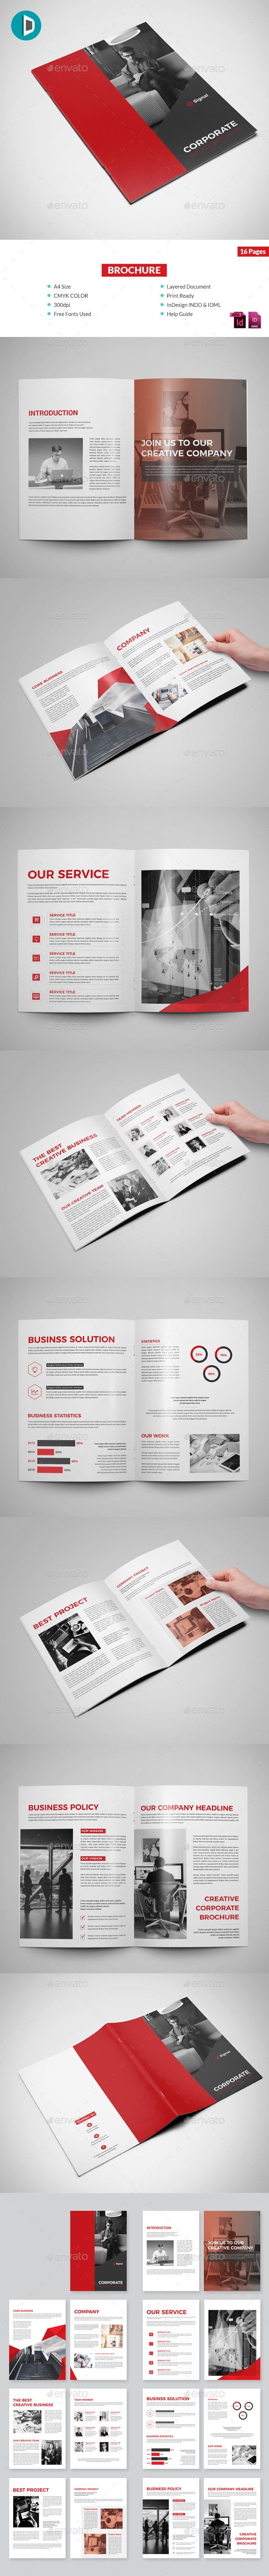 Brochure Template InDesign INDD | Brochure Templates | Pinterest ...